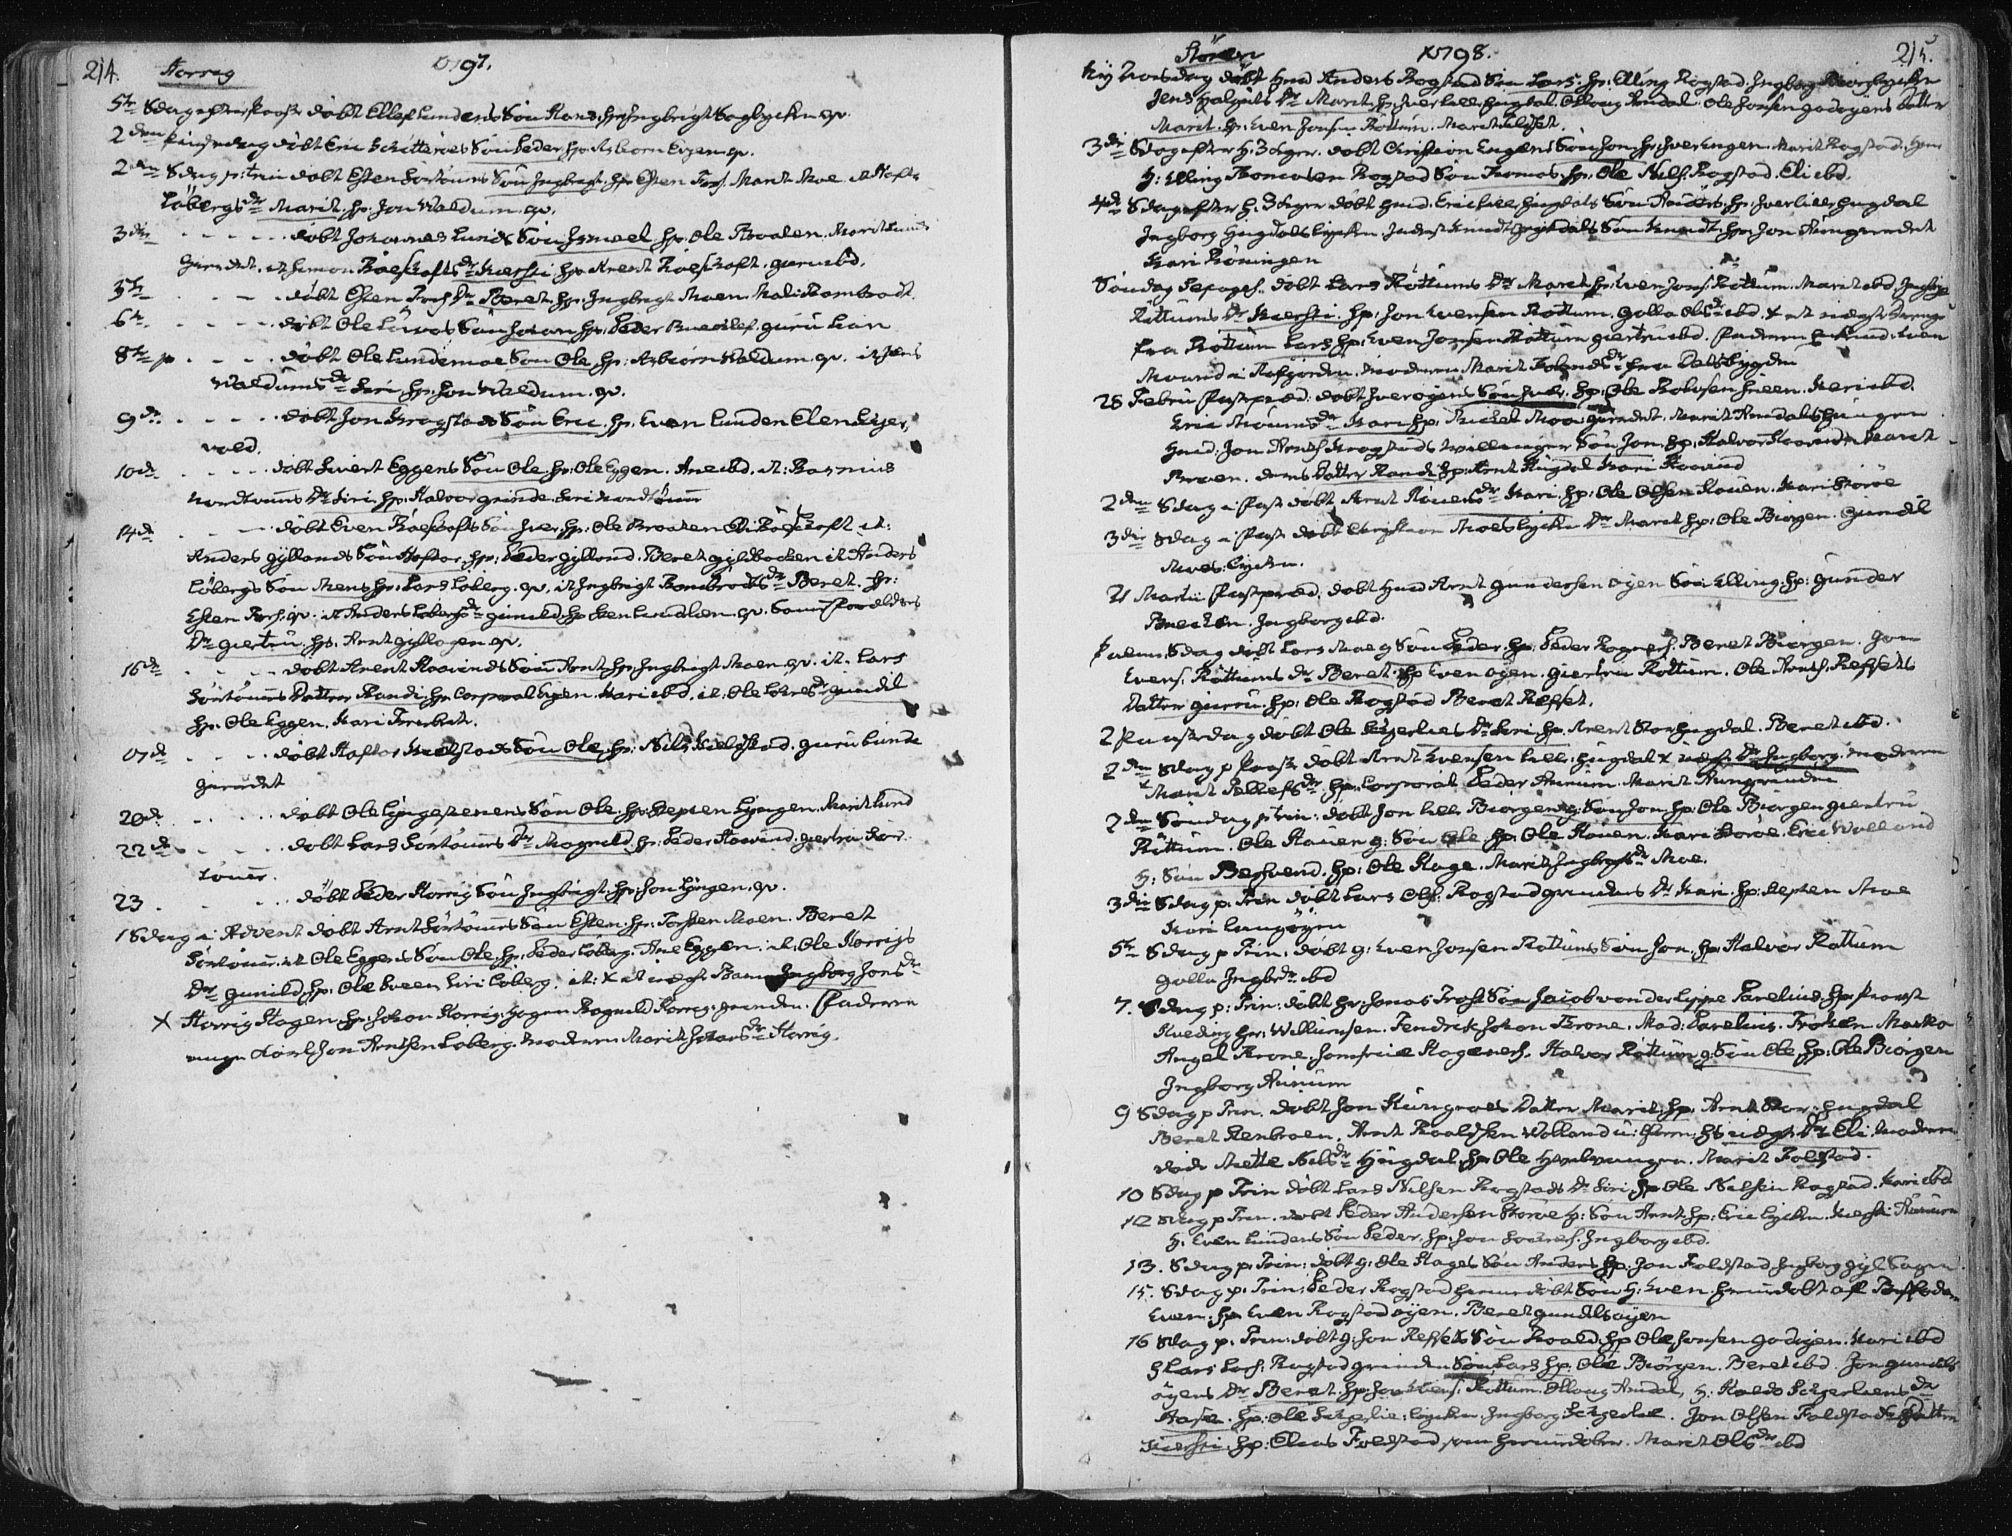 SAT, Ministerialprotokoller, klokkerbøker og fødselsregistre - Sør-Trøndelag, 687/L0992: Parish register (official) no. 687A03 /1, 1788-1815, p. 214-215